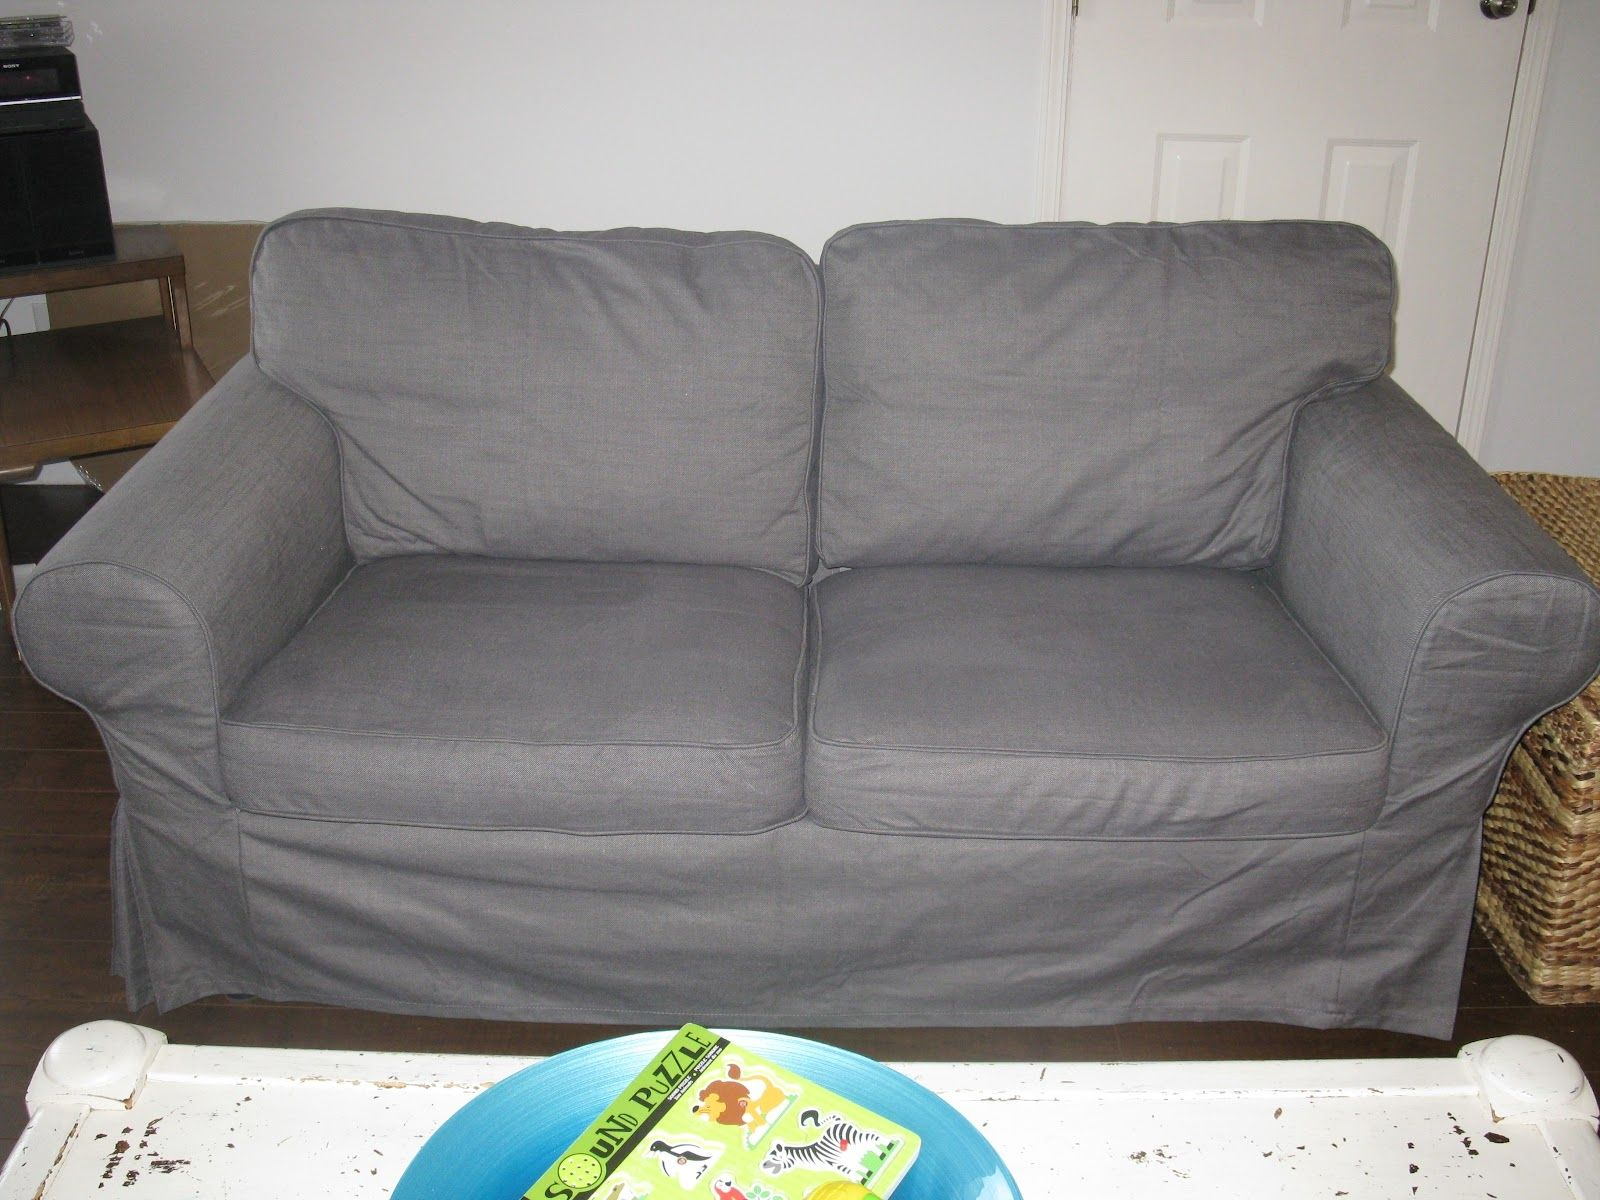 Fabric Dye Sofa Covers